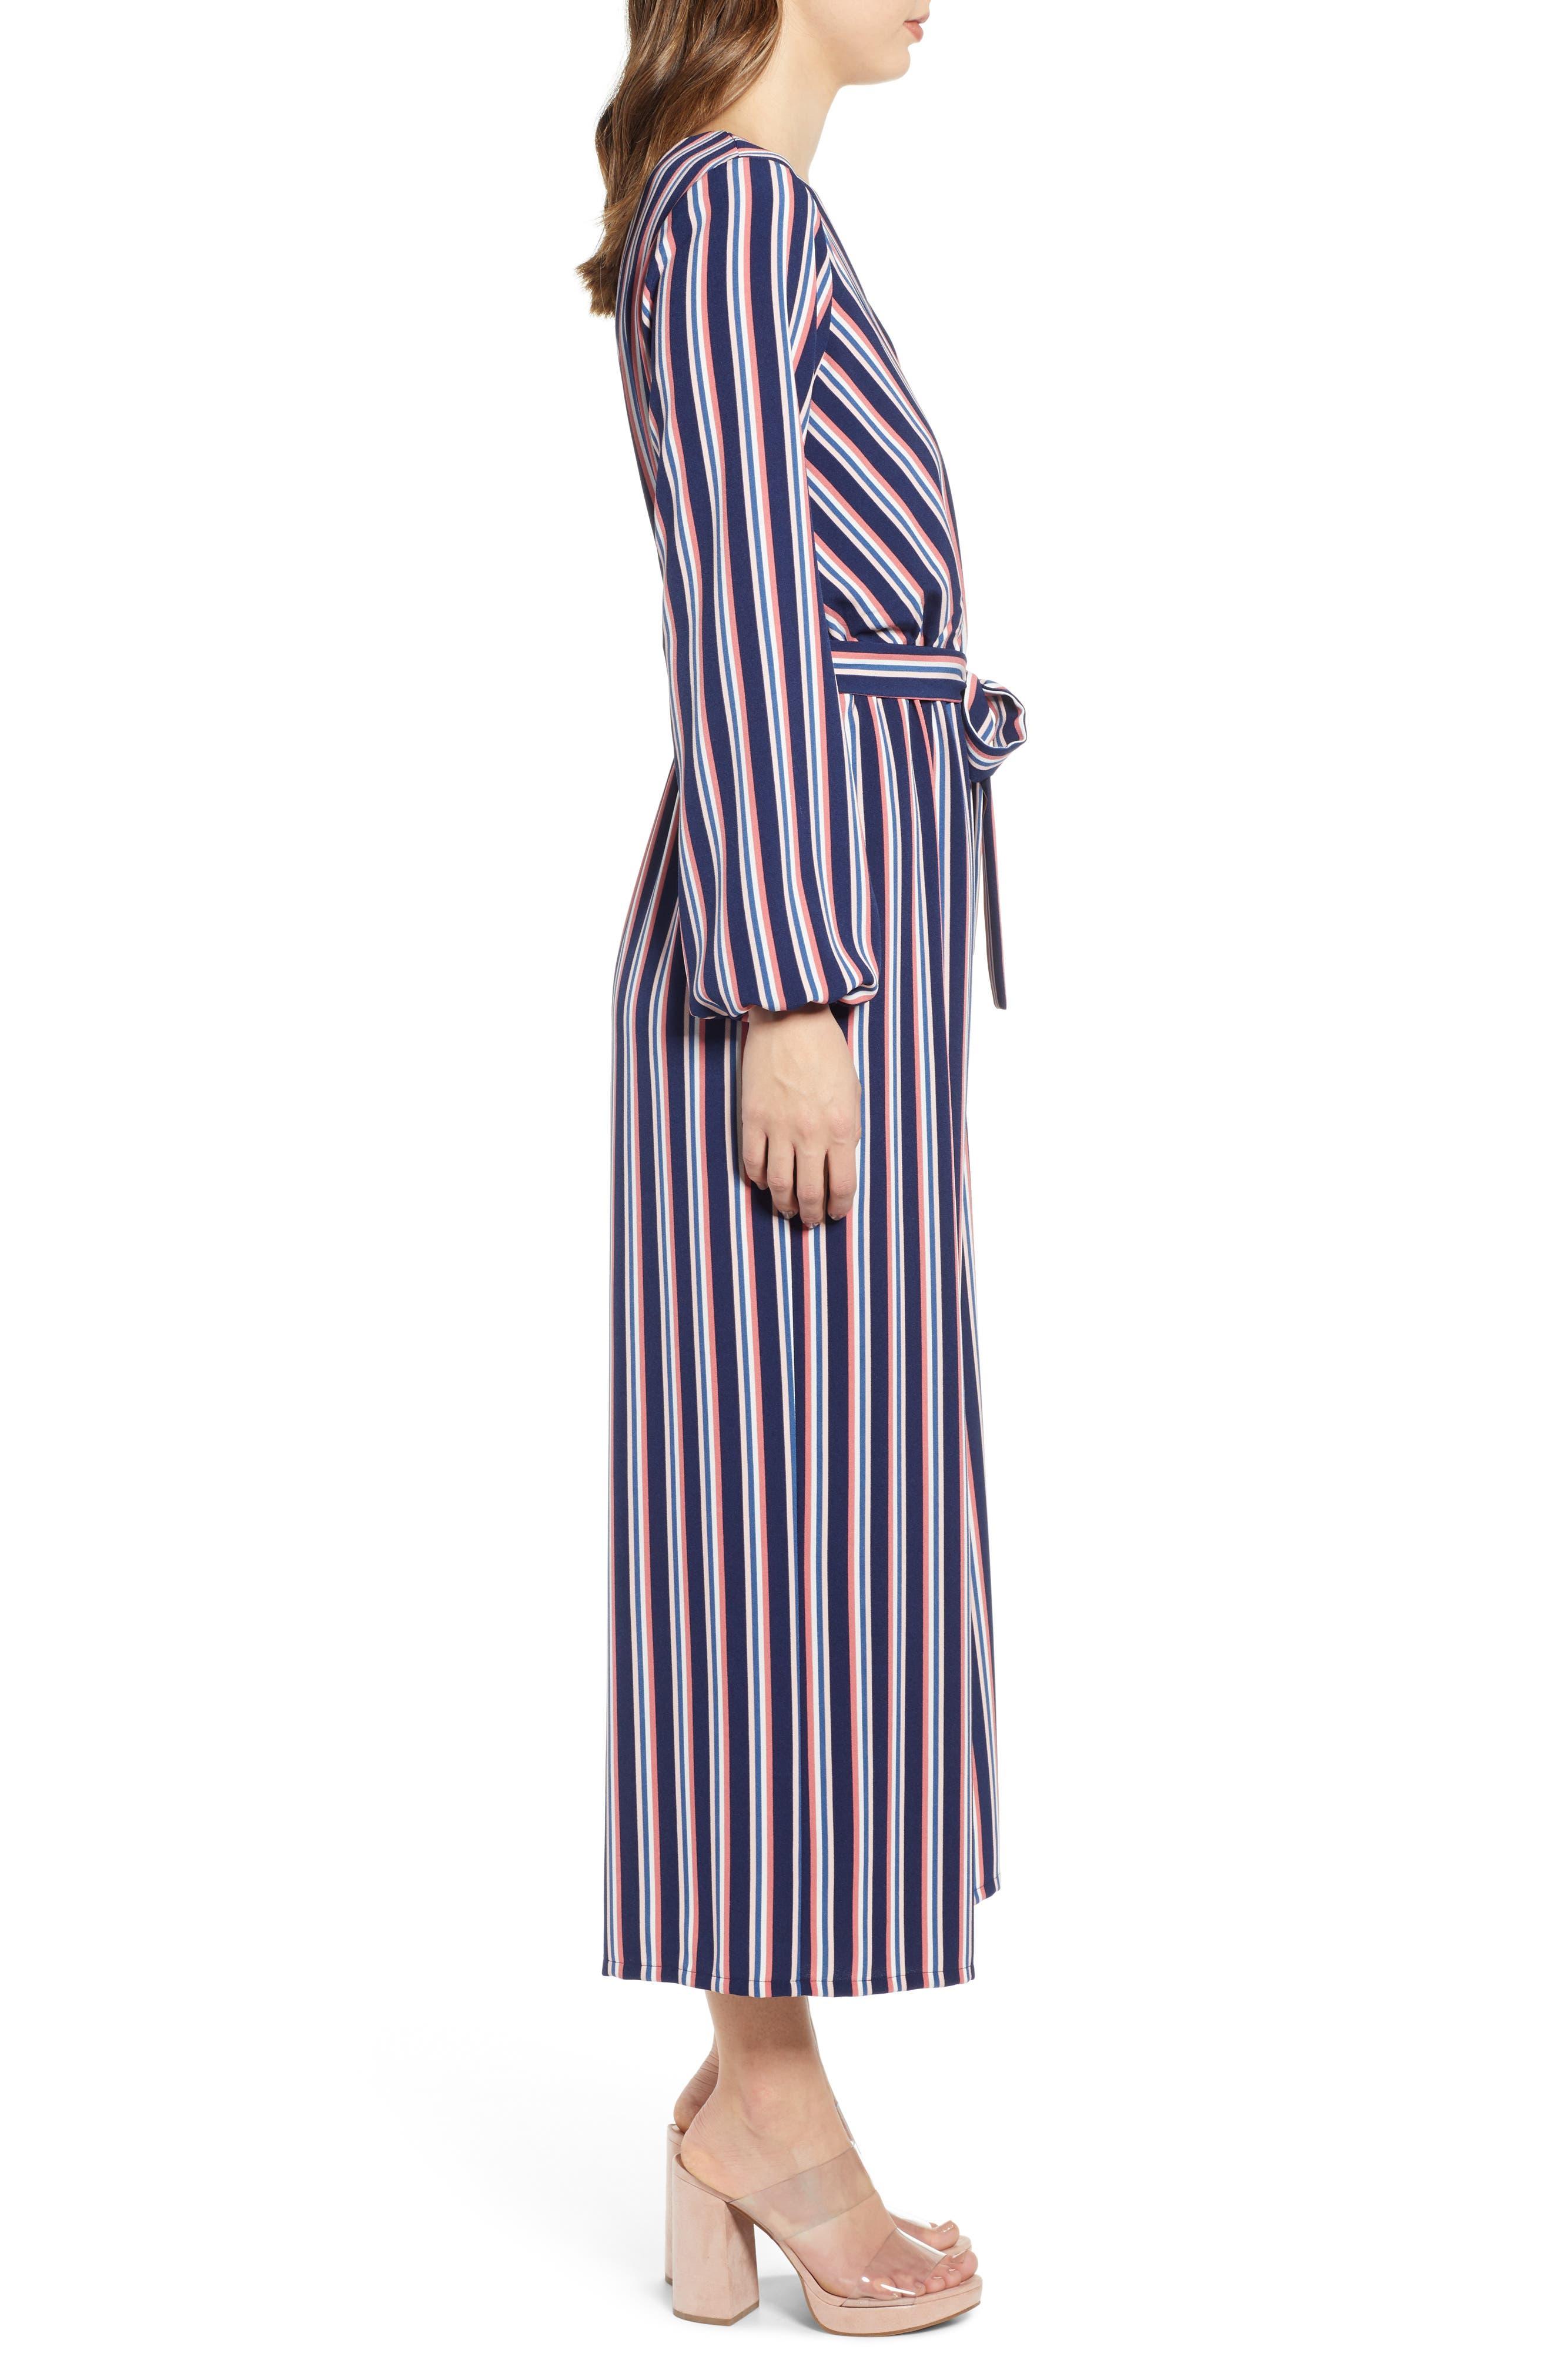 LEITH, Stripe Surplice Jumpsuit, Alternate thumbnail 4, color, NAVY PEACOAT FEM STRIPE